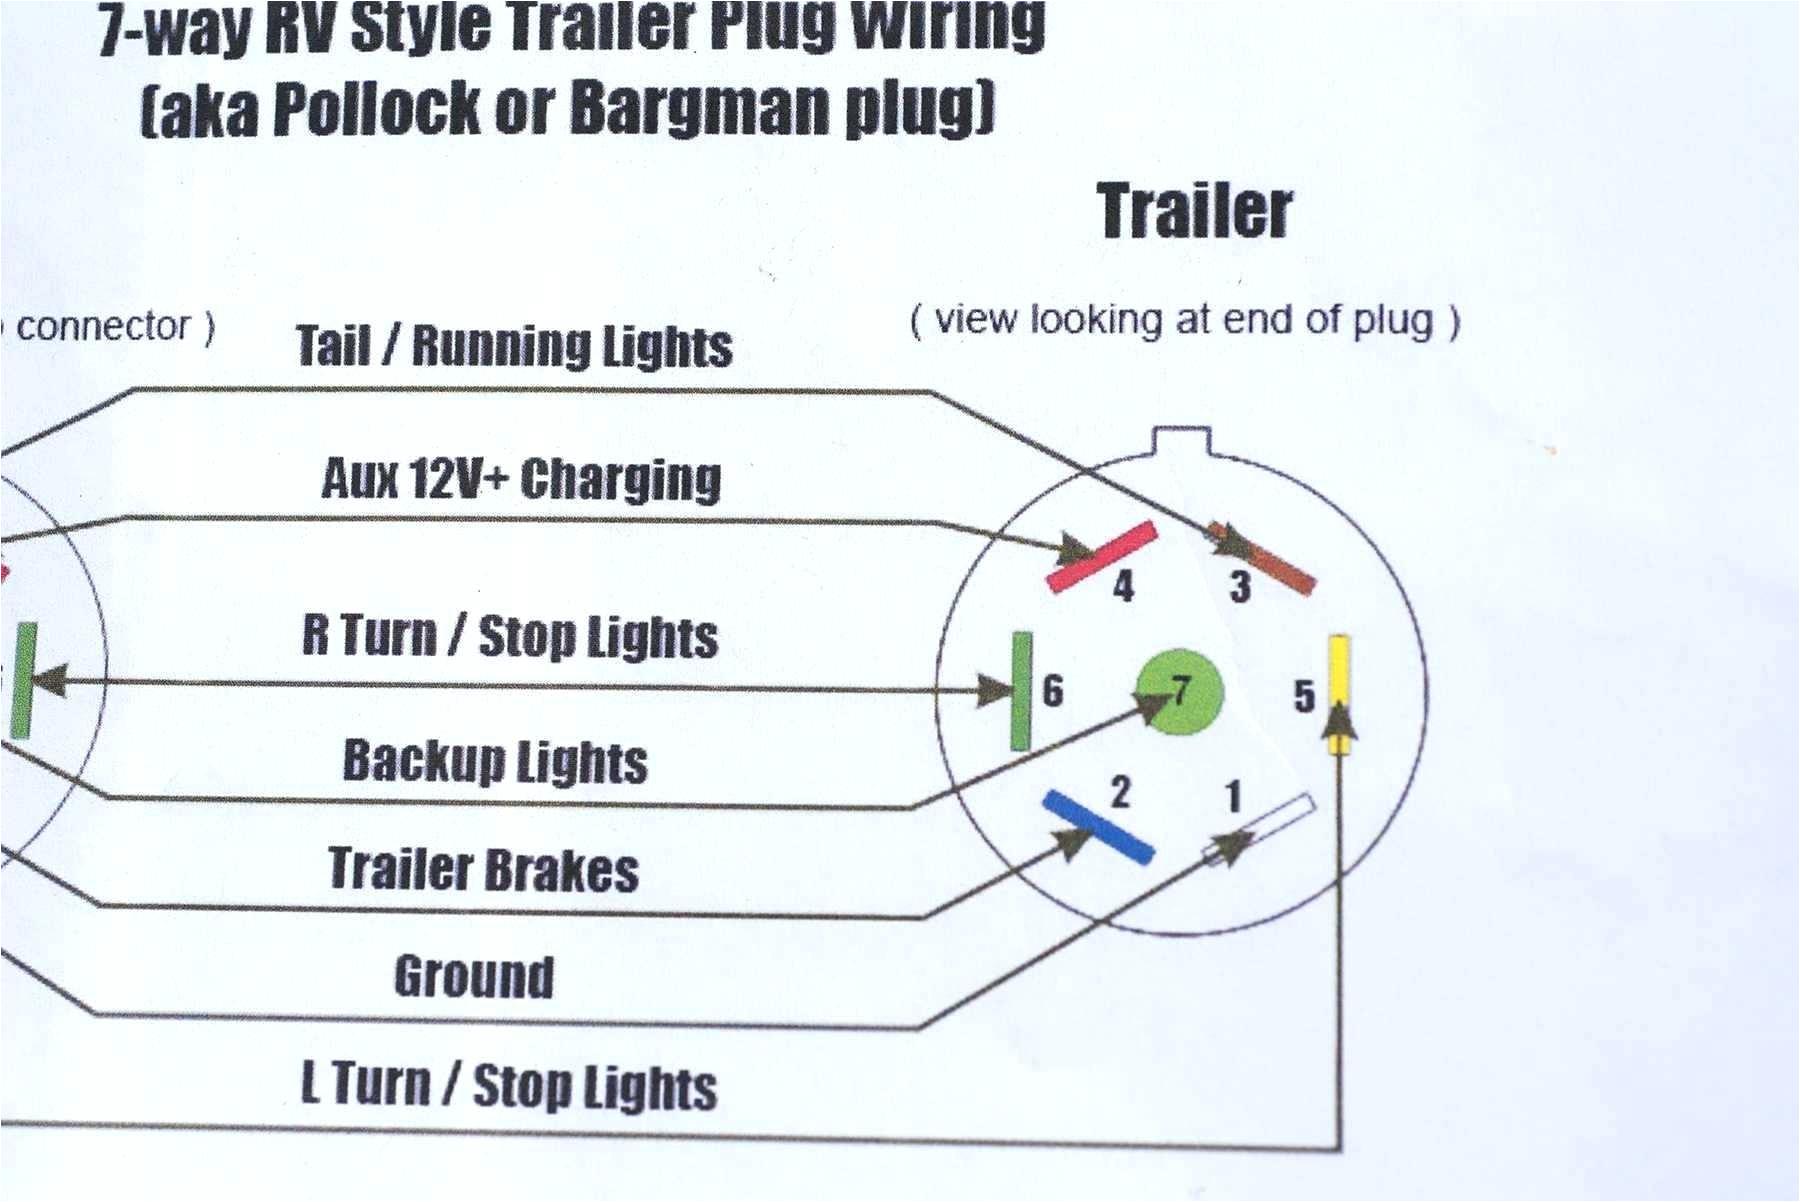 six pin wiring diagram wiring diagrams bib six pin connector wiring diagram six pin connector wiring diagram